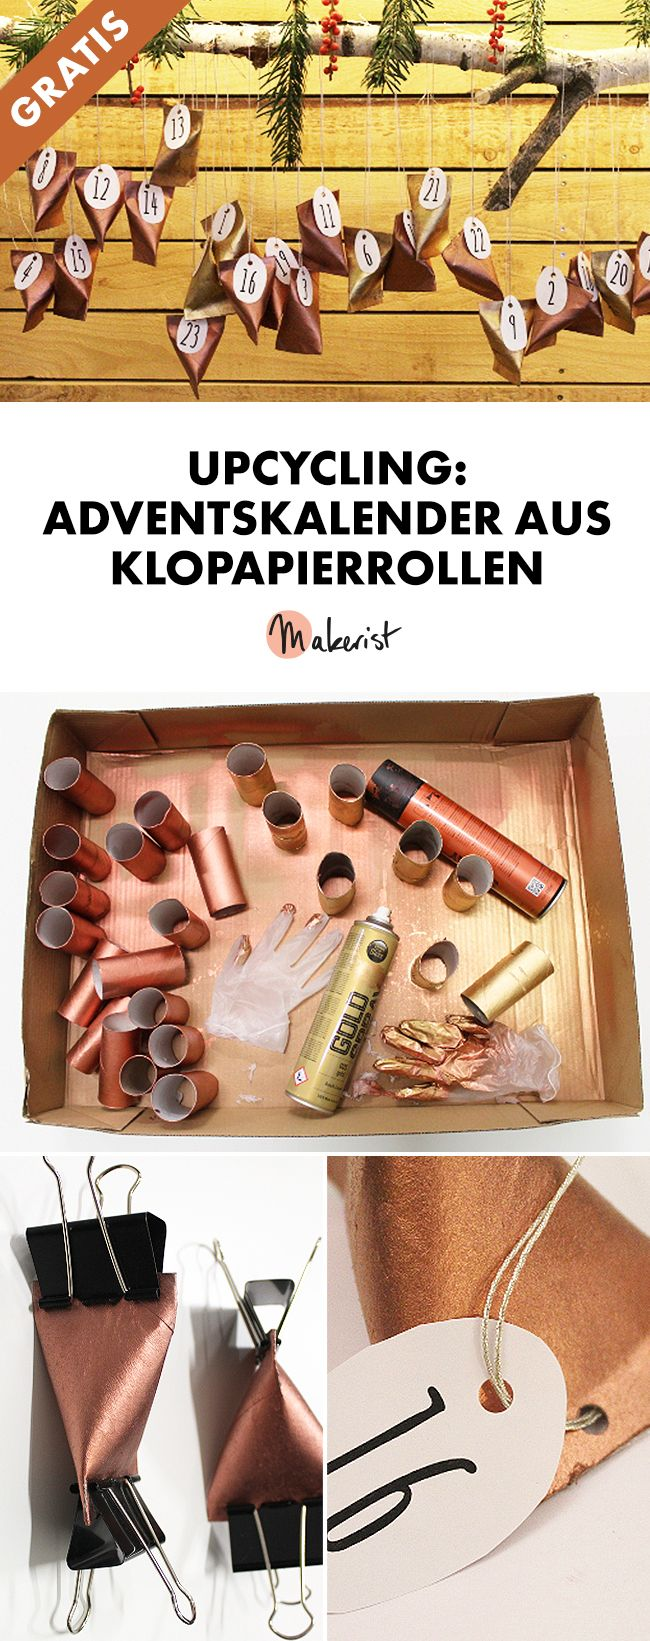 Upcycling: Adventskalender aus Klopapierrollen basteln - Gratis-DIY-Anleitung via Makerist.de